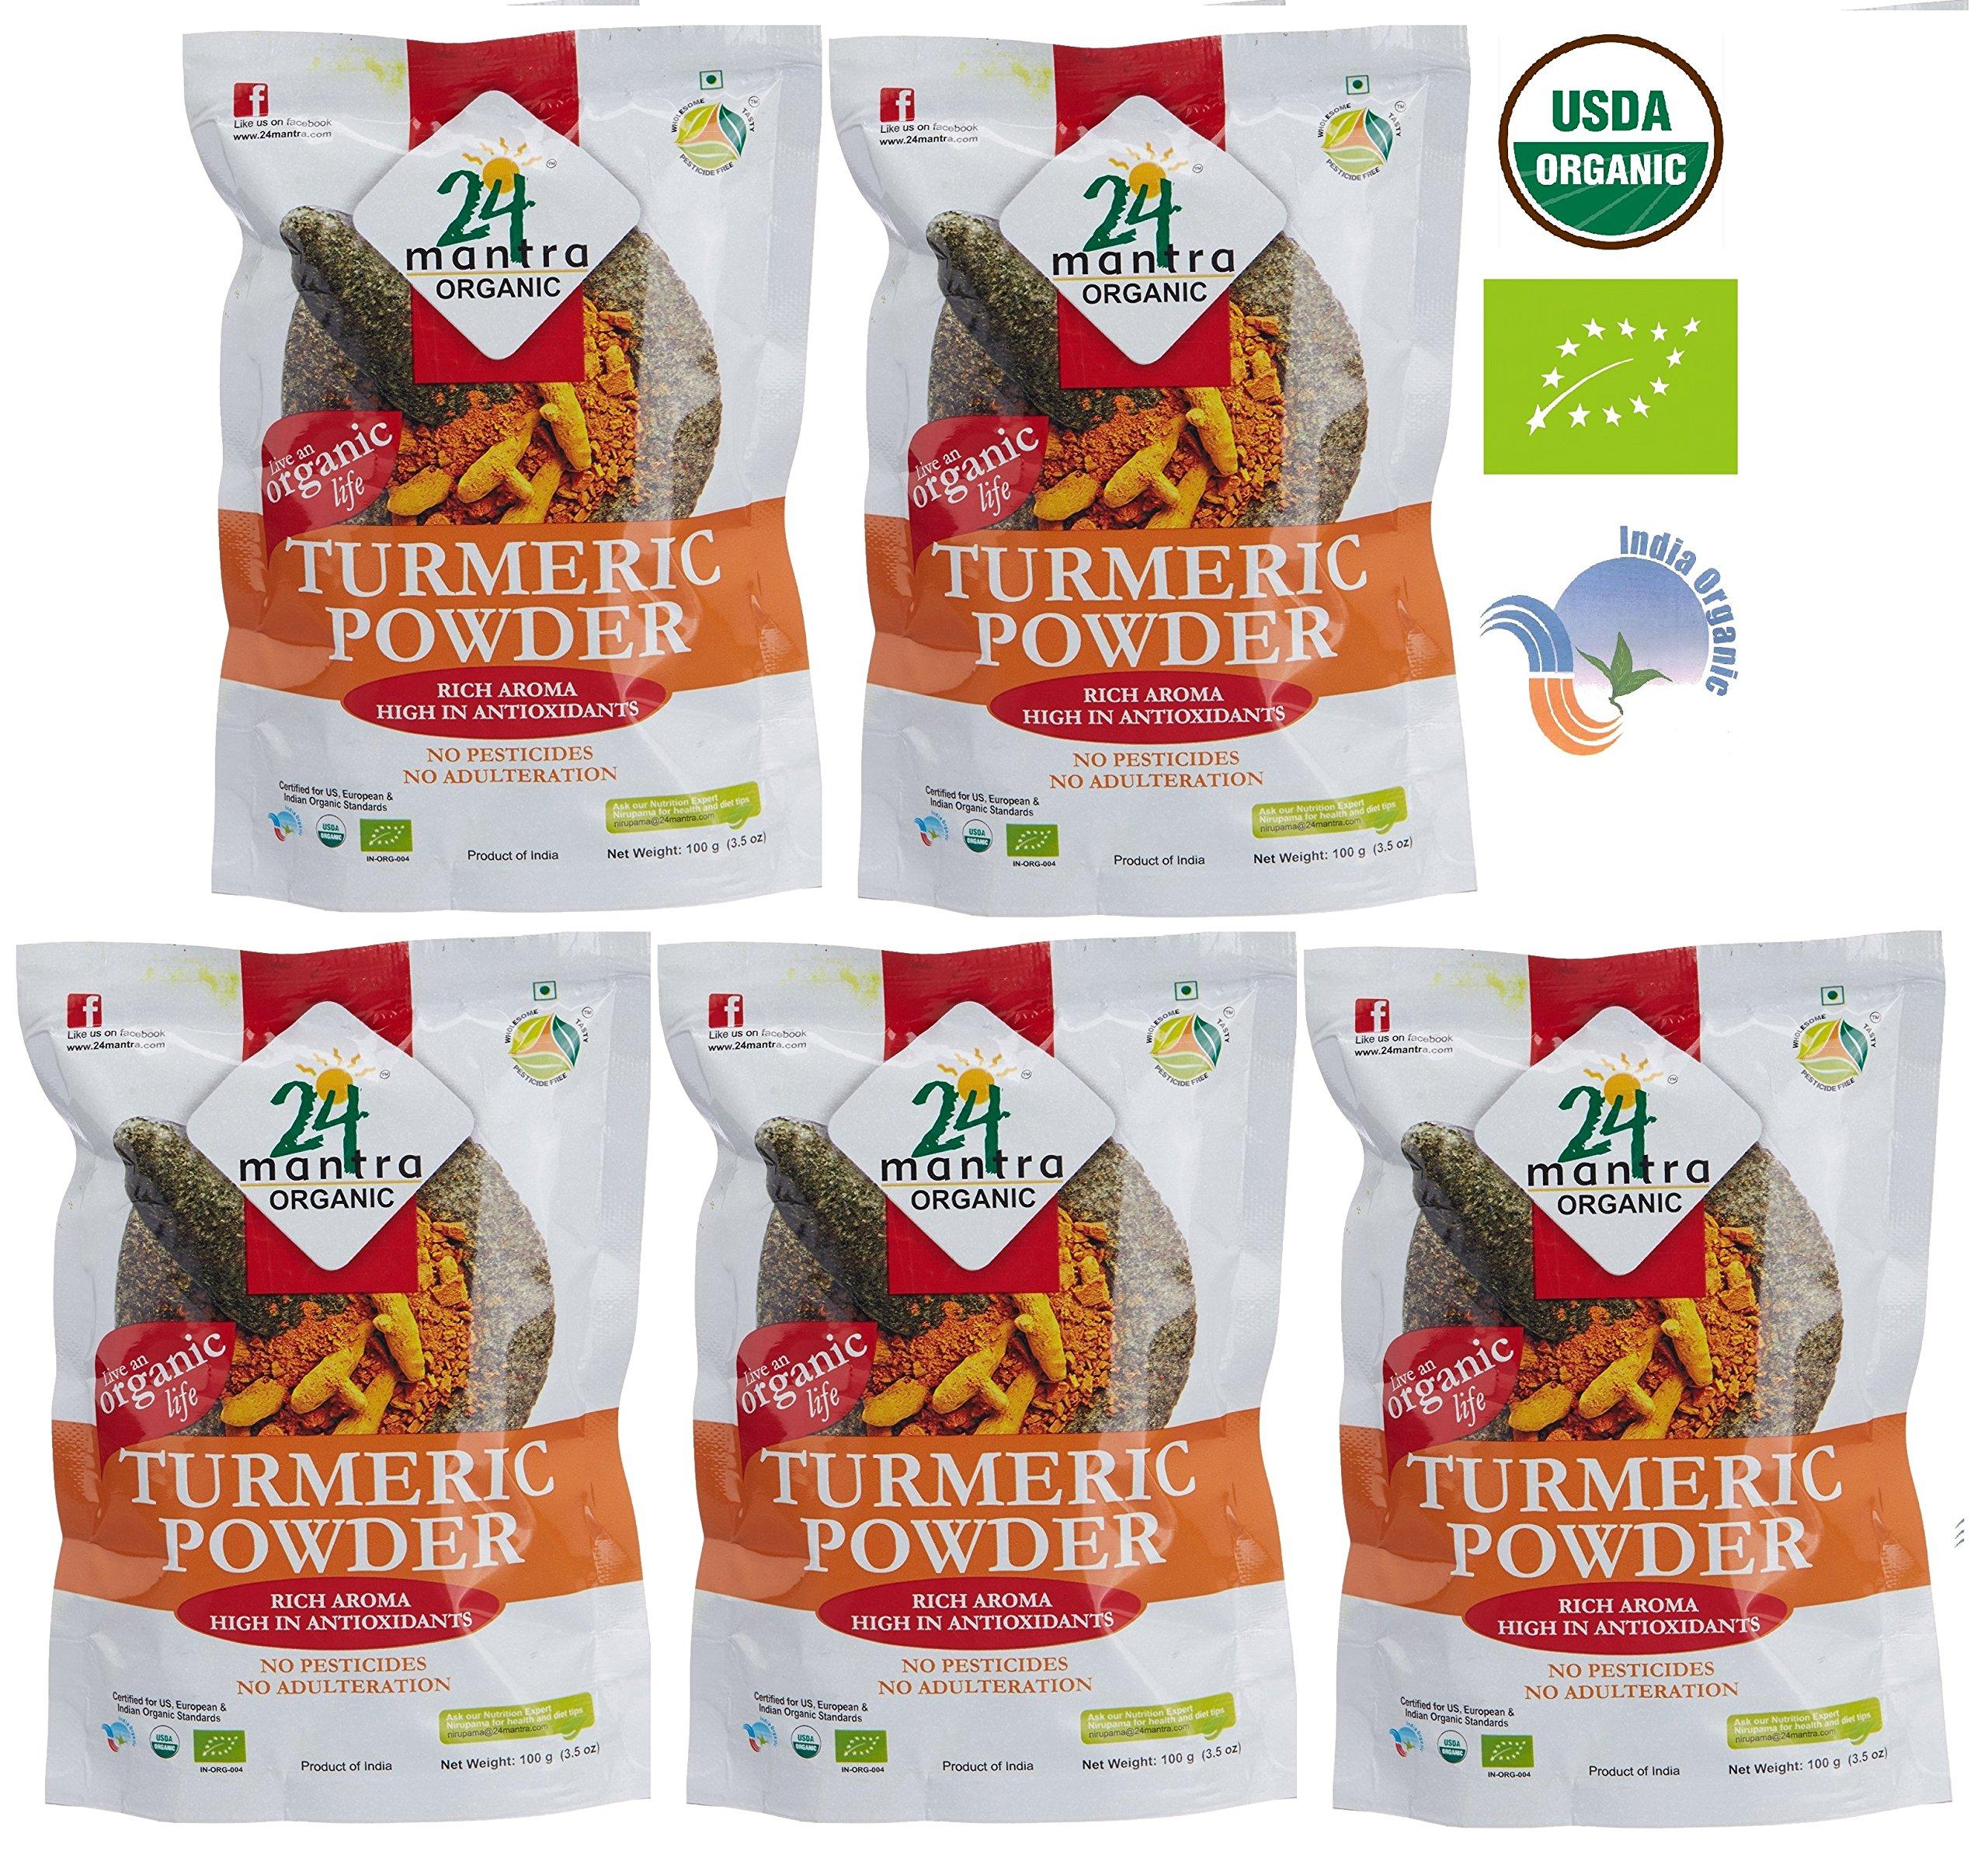 Organic Turmeric Powder - Curcumin Powder ★ USDA Certified Organic ★ EU Certified Organic ★ Pesticides Free ★ Sodium Free - Pack of 5 X 3.5 Oz (1 LB and 1.5 Ounces) - 24 Mantra Organic